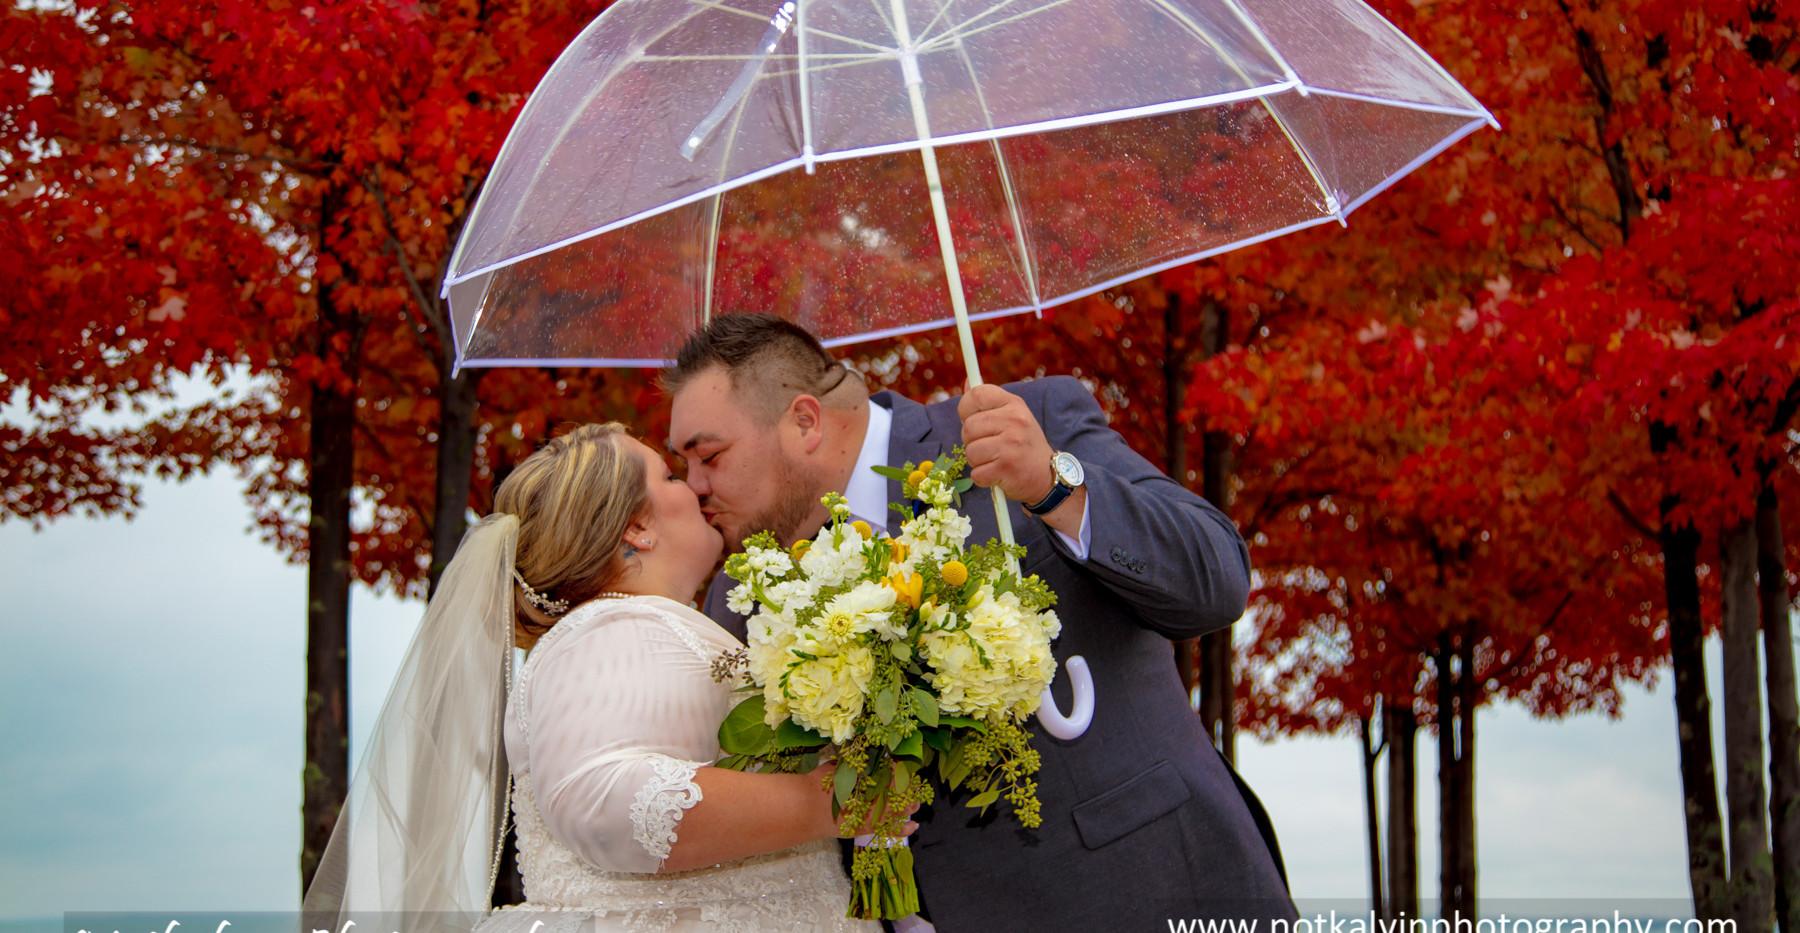 T+T Wedding - 1z3a5953.jpg